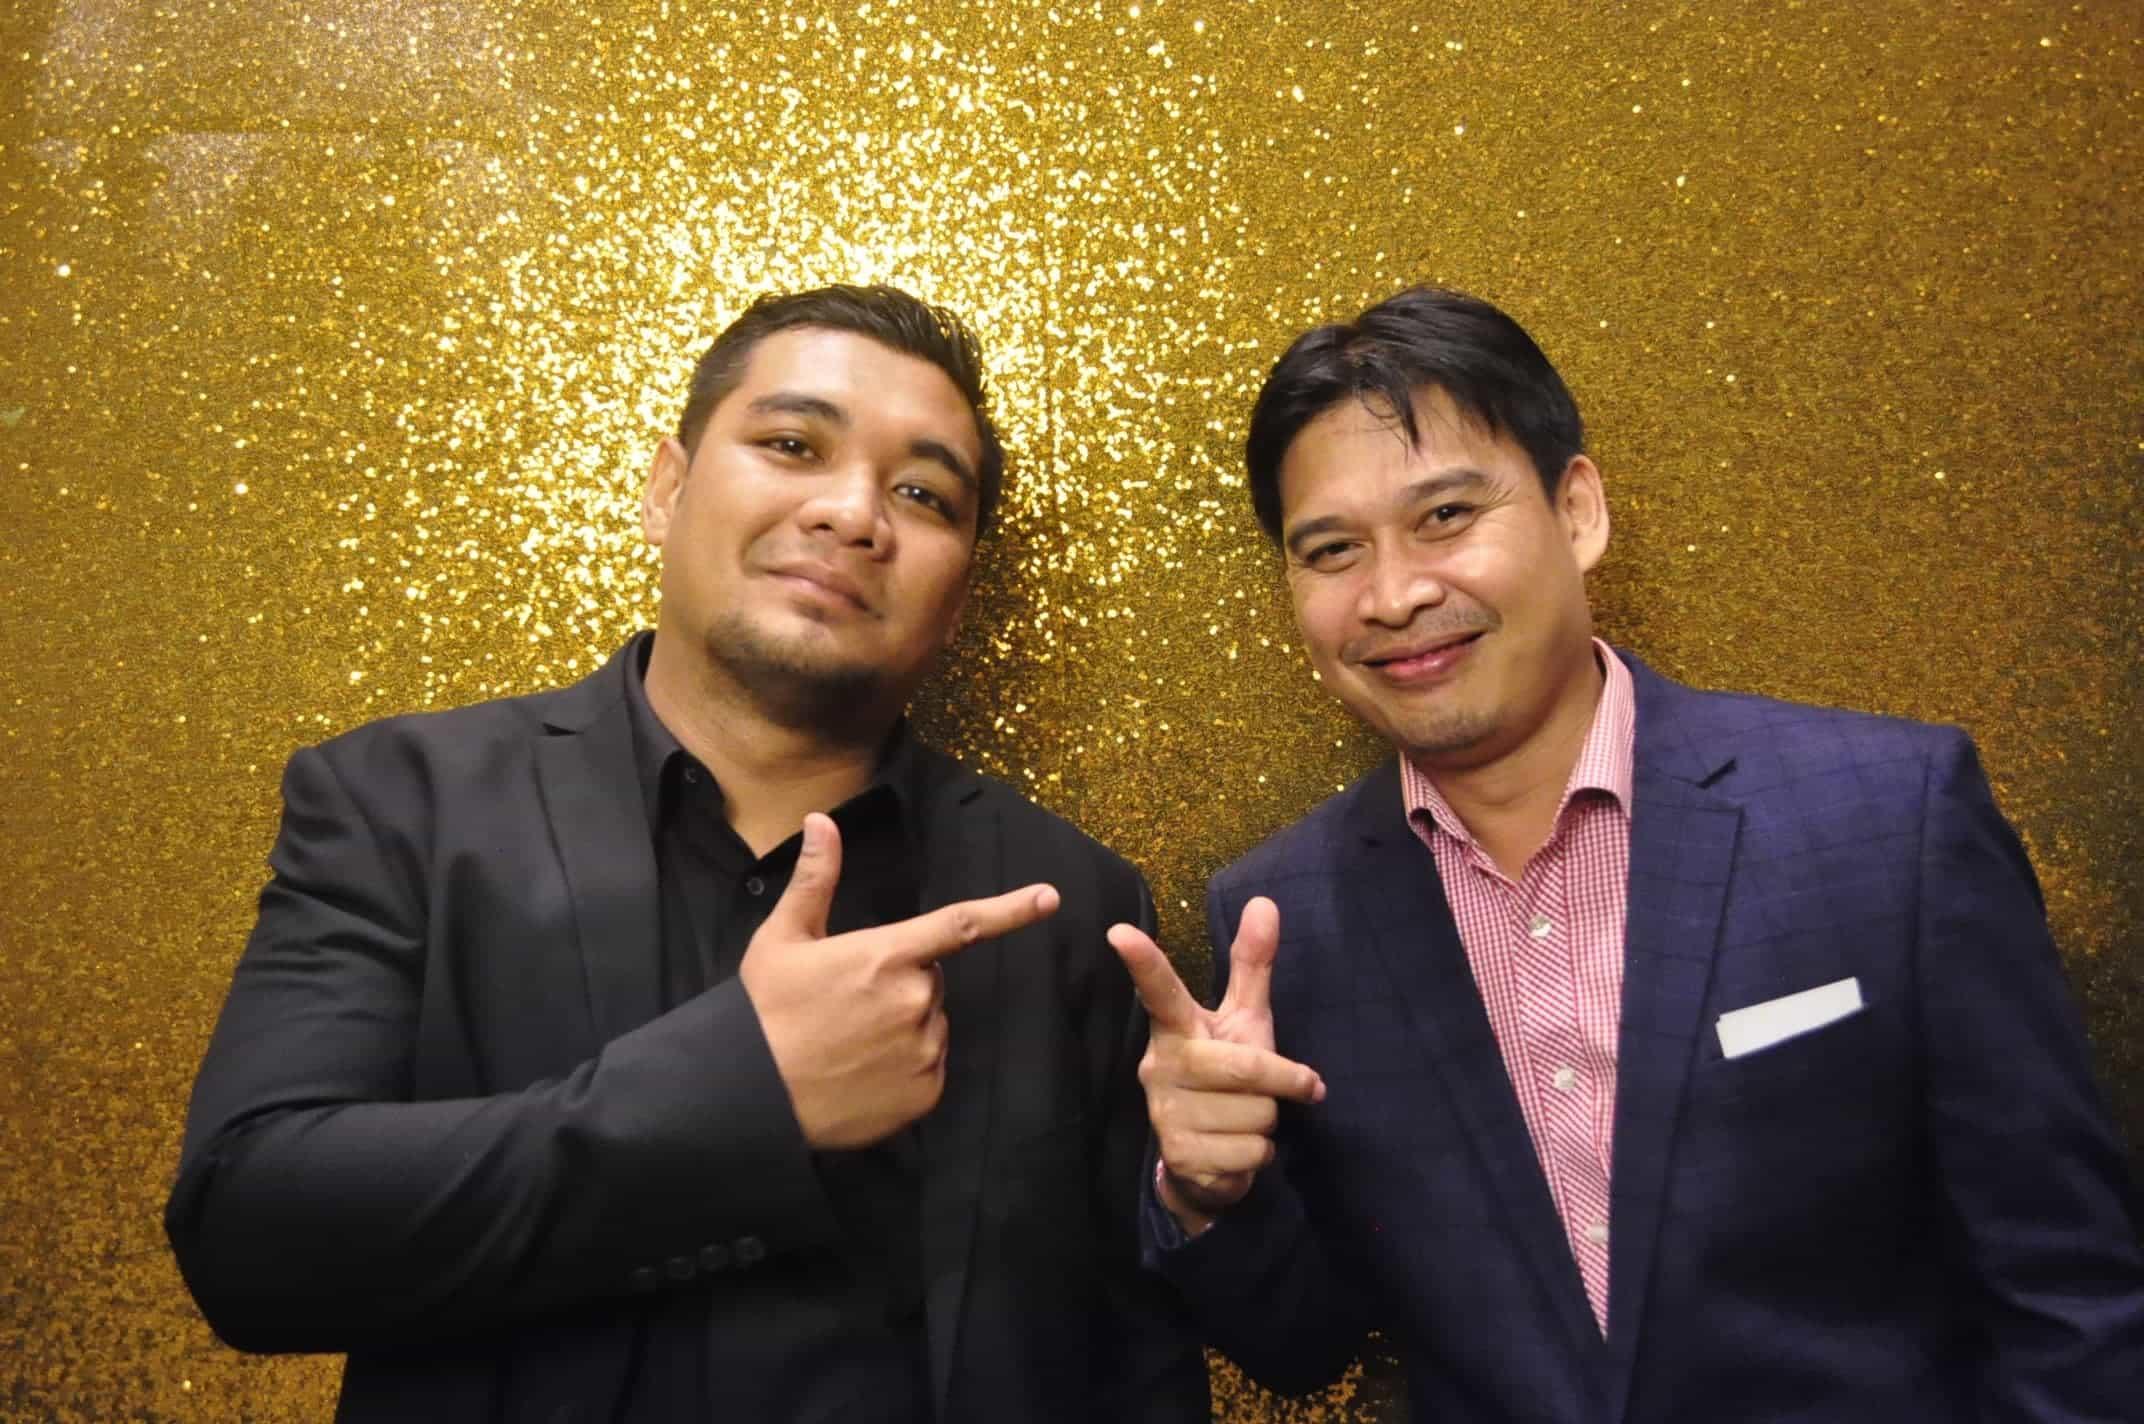 Malam Gala Anggun 2018 (Photobooth) 12